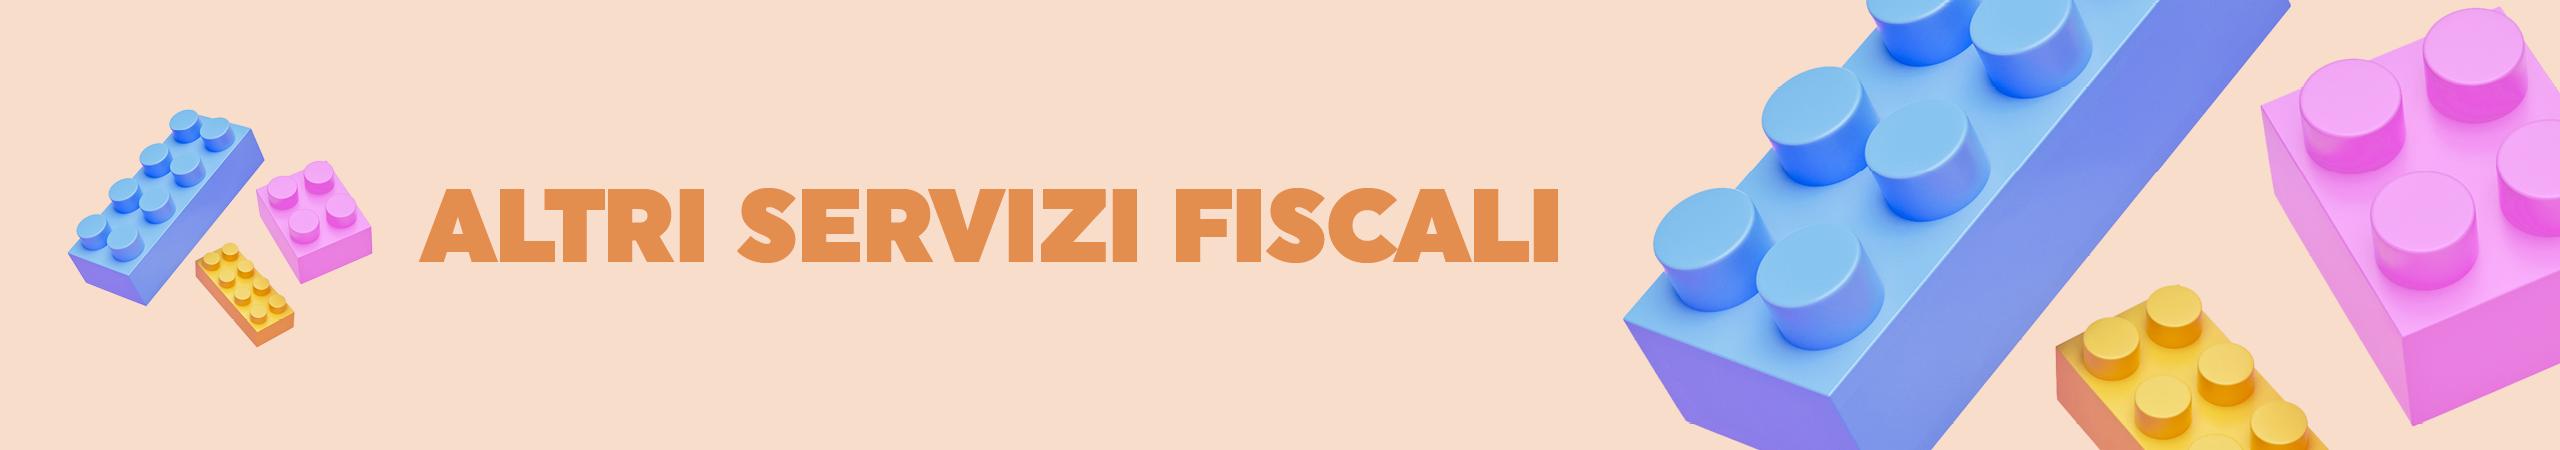 Caaf Emilia Romagna - Altri servizi fiscali